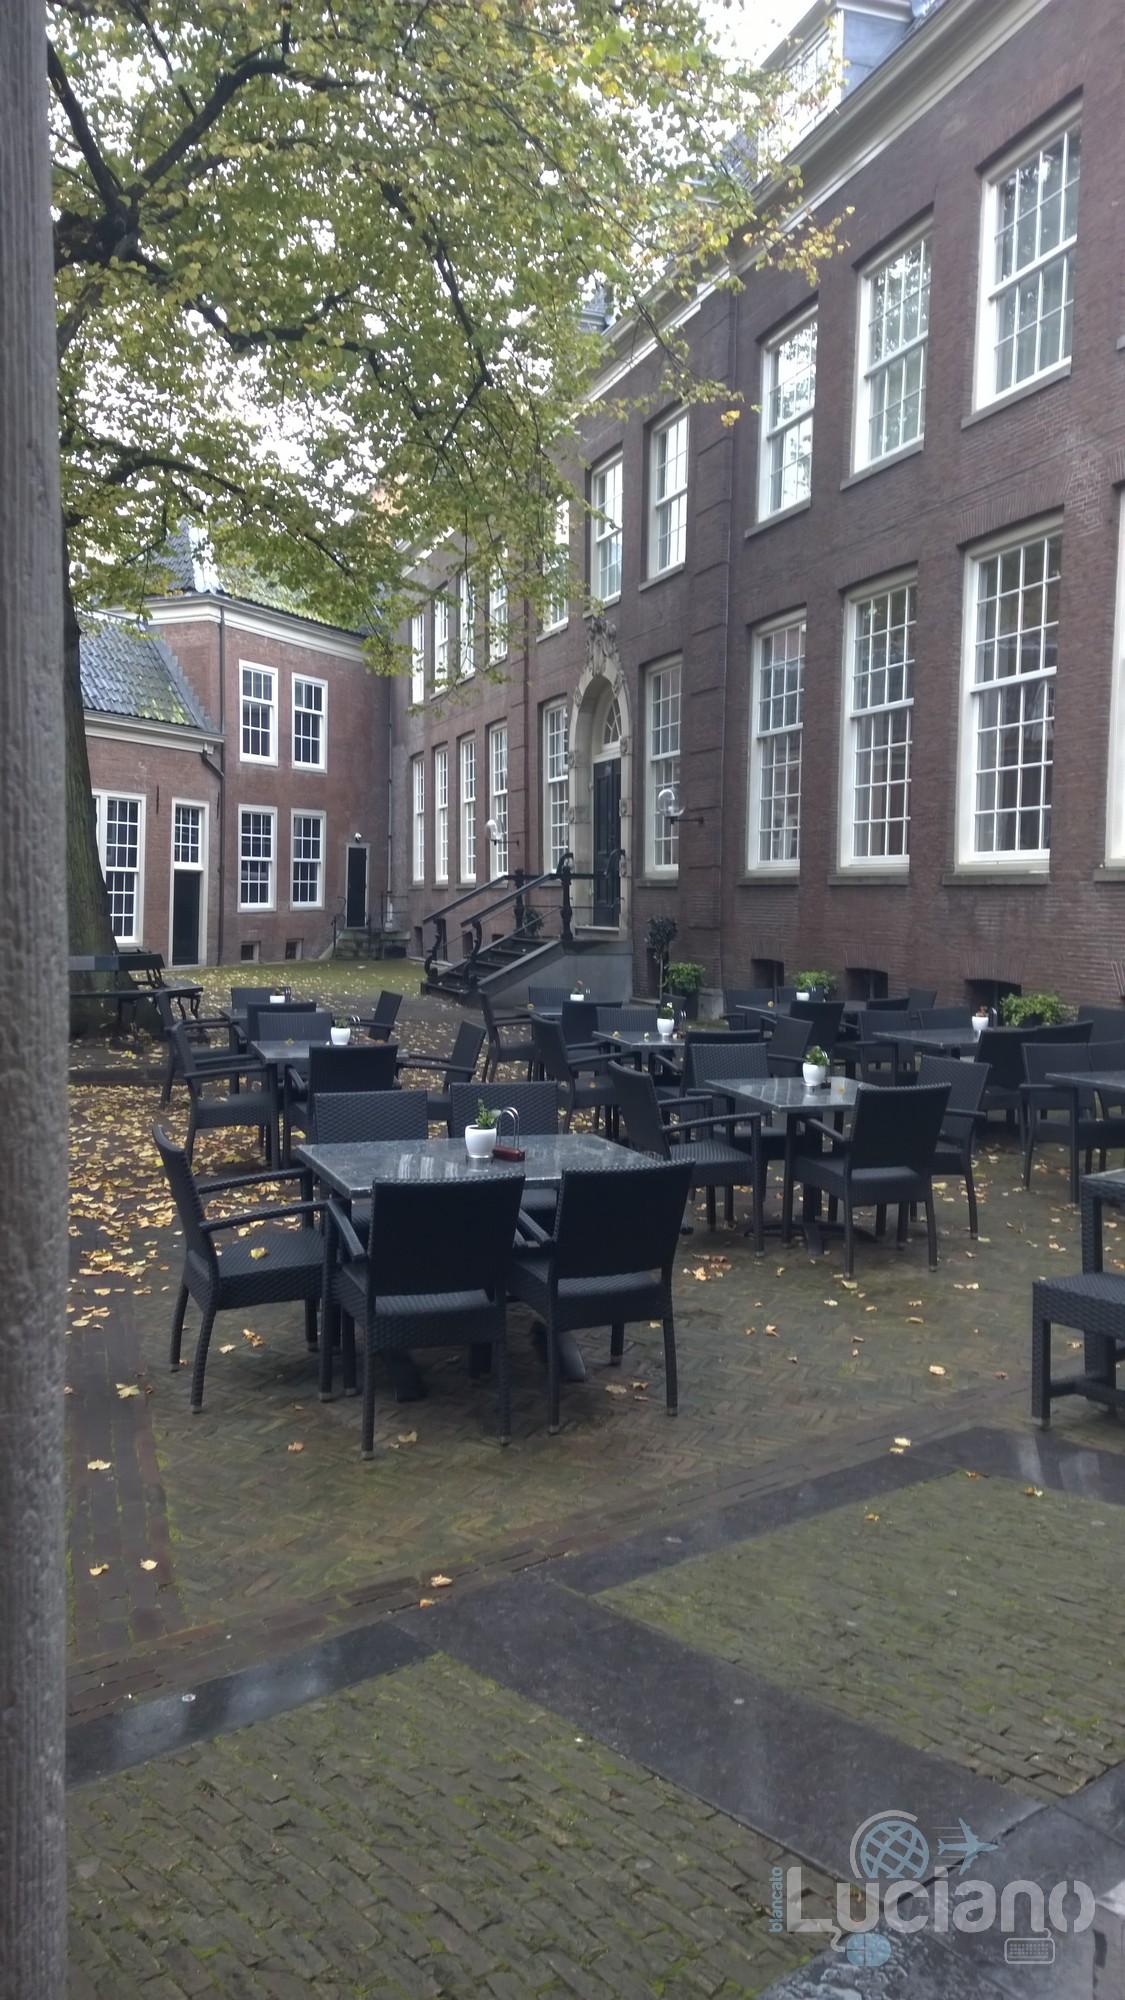 amsterdam-2014-vueling-lucianoblancatoit (155)